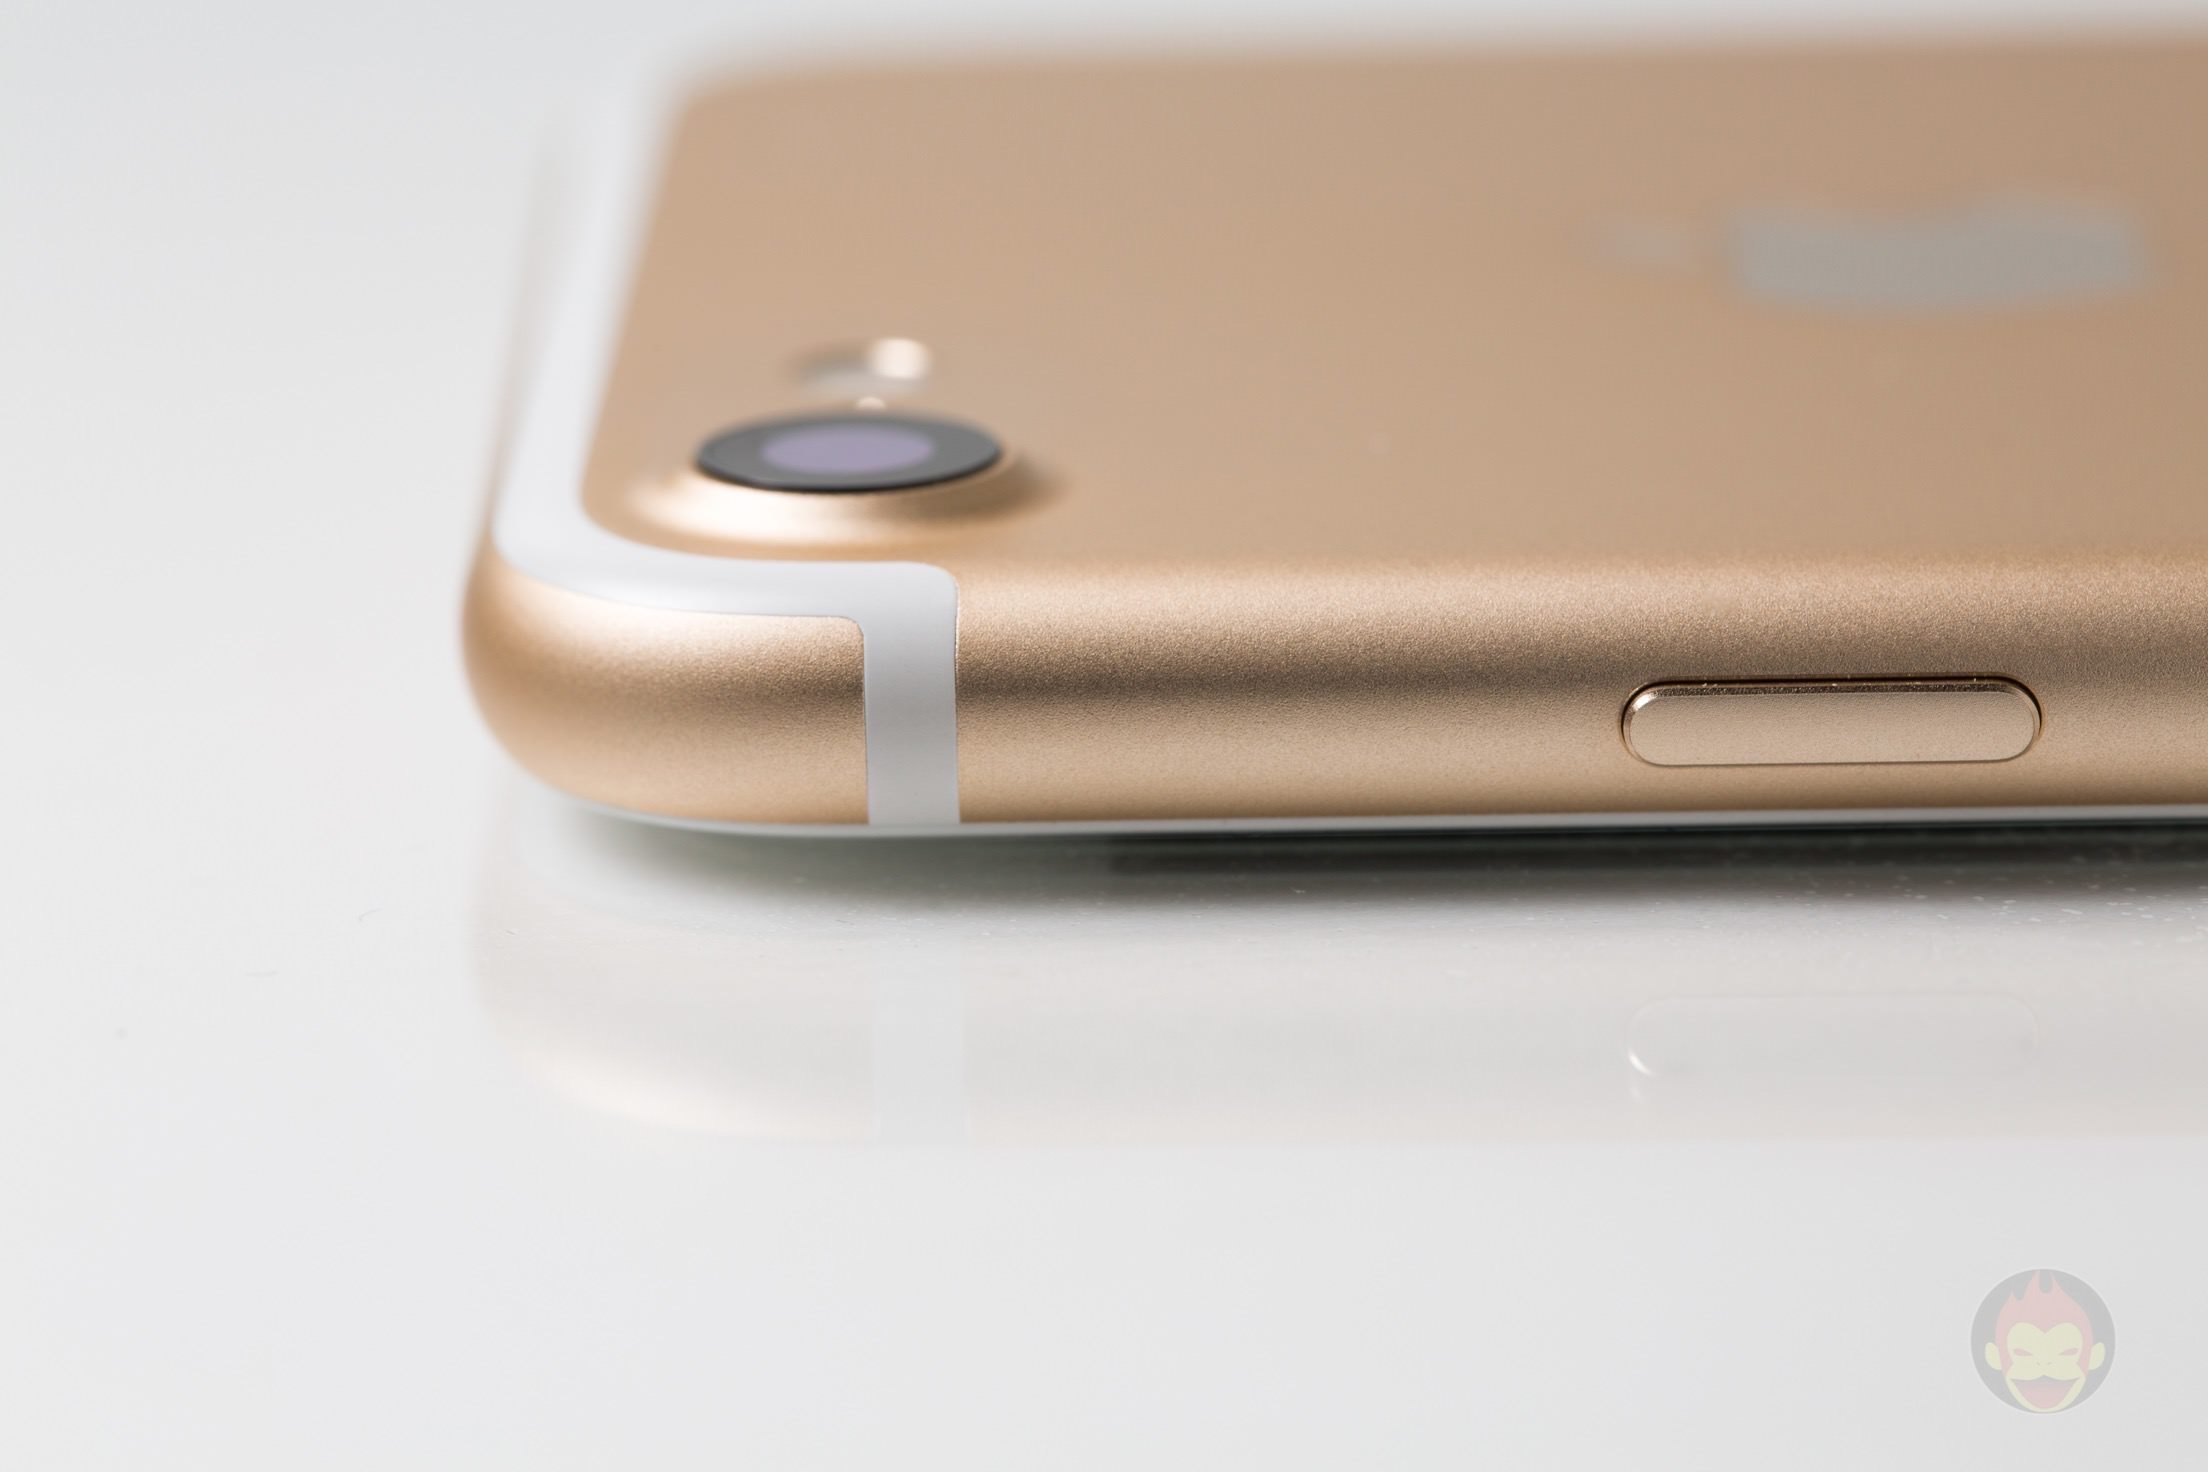 iPhone-7-Gold-Model-21.jpg